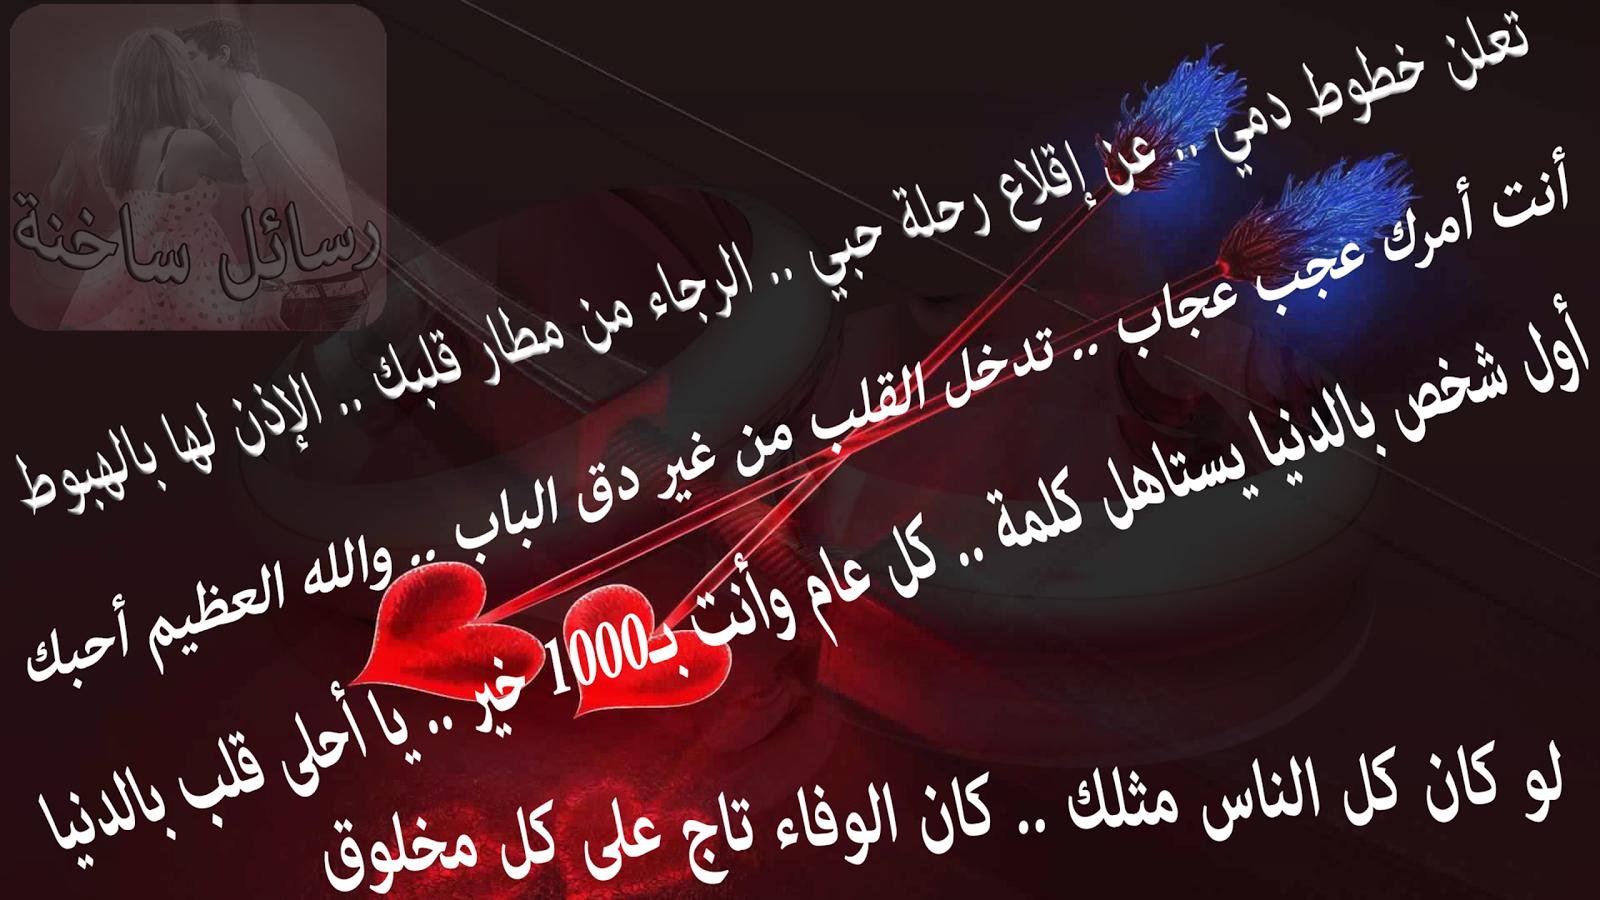 بالصور صور رسائل حب , اجمل مسجات حب وعشق 5028